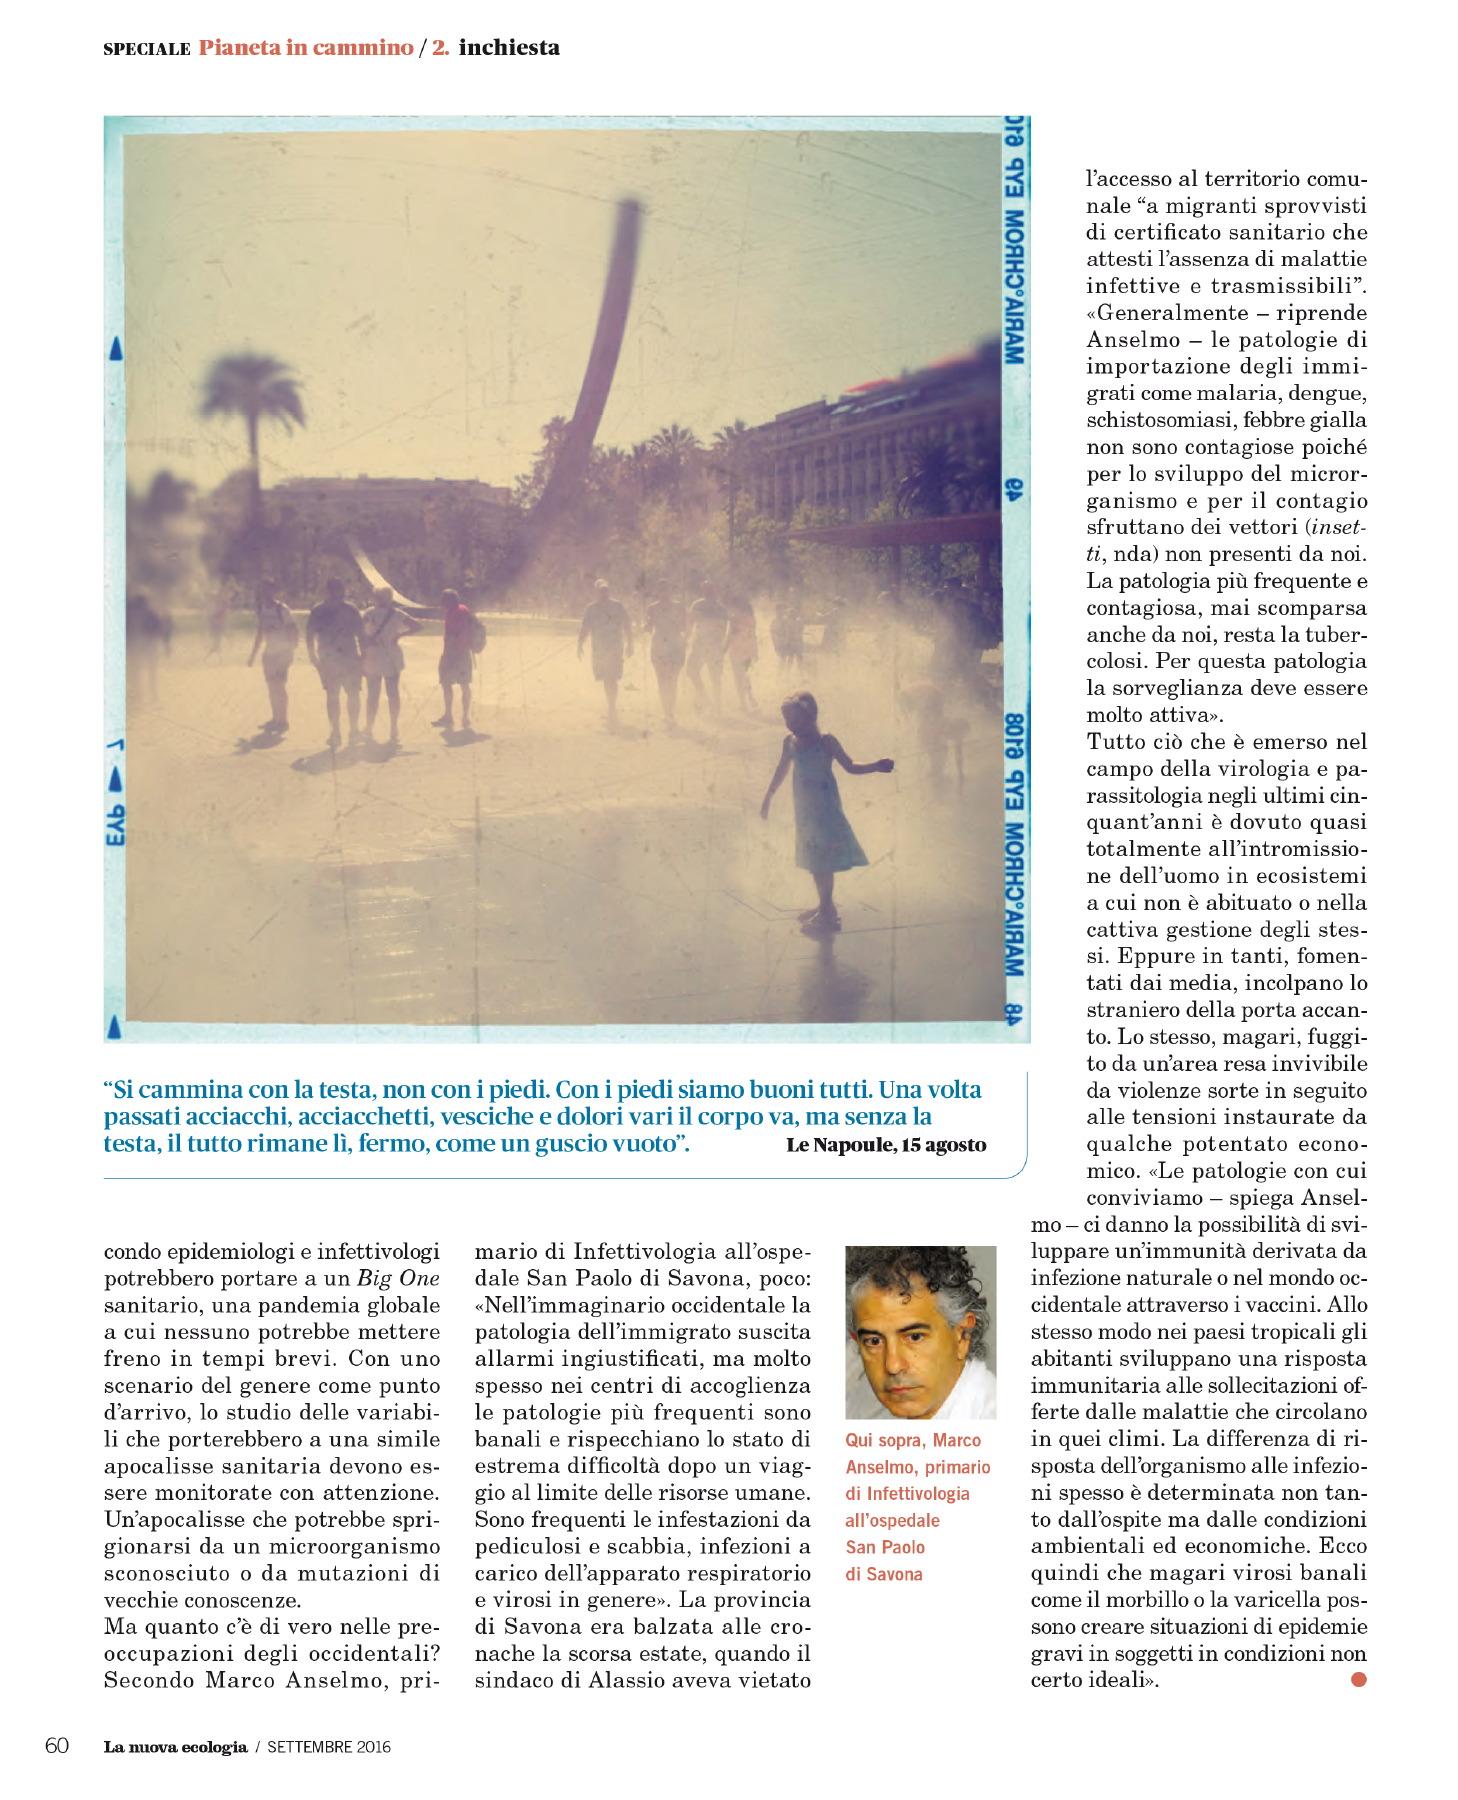 around-the-walk-_-pietro-vertamy-_tearsheet-nuova-ecologia-06